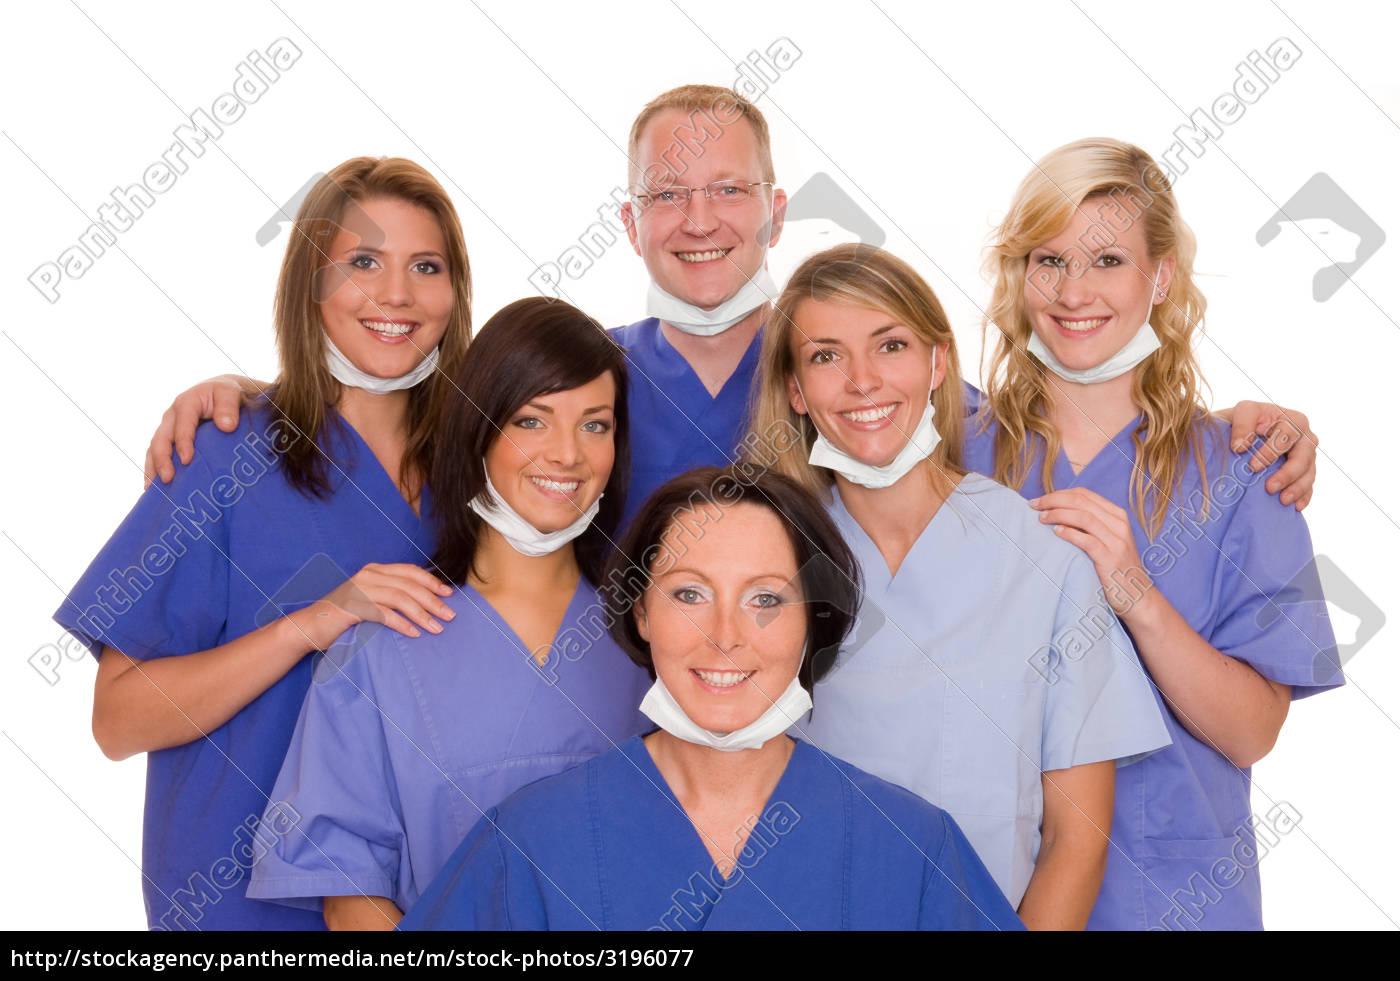 health - 3196077